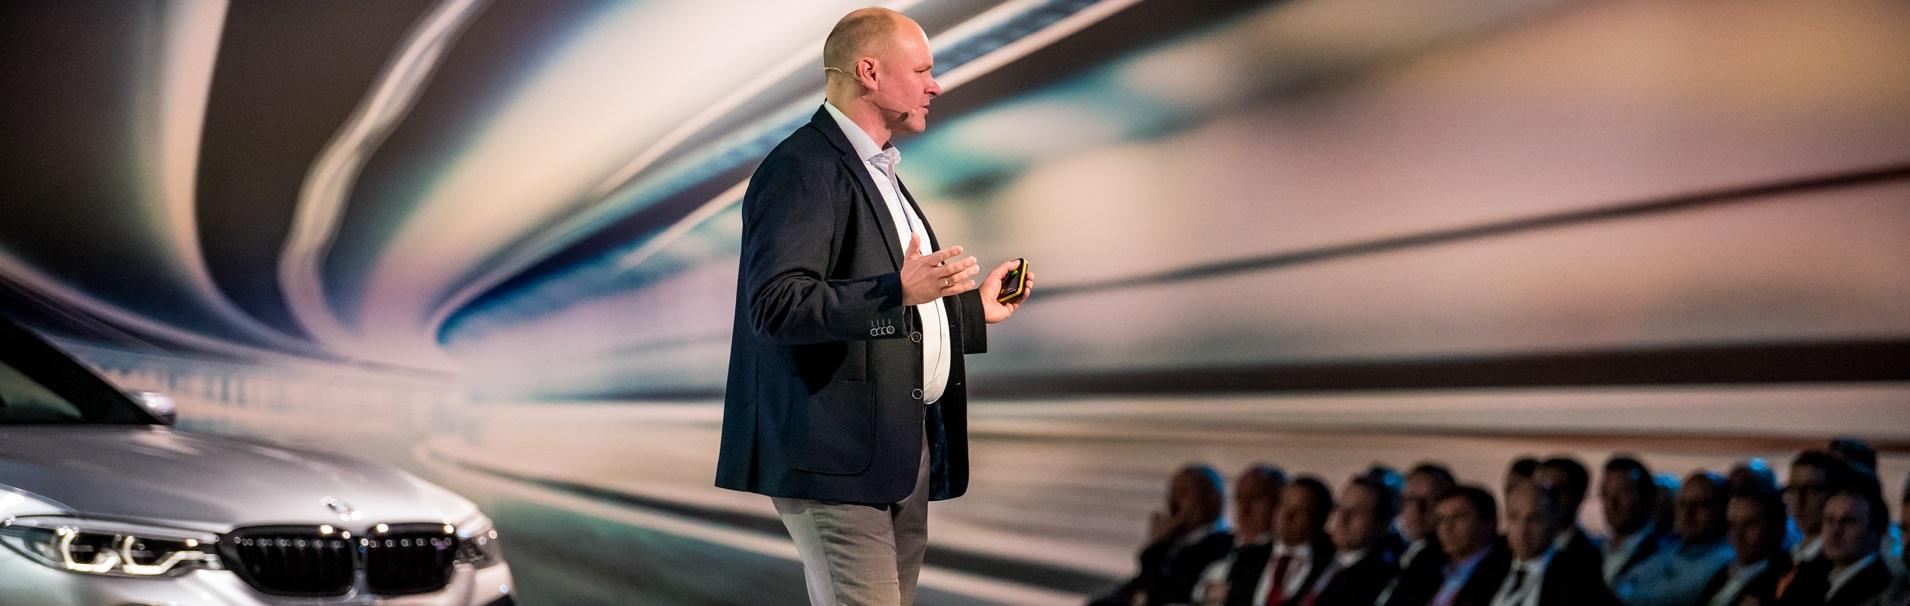 keynote speaker und Leadership Experte Dr. Holger Schmitz